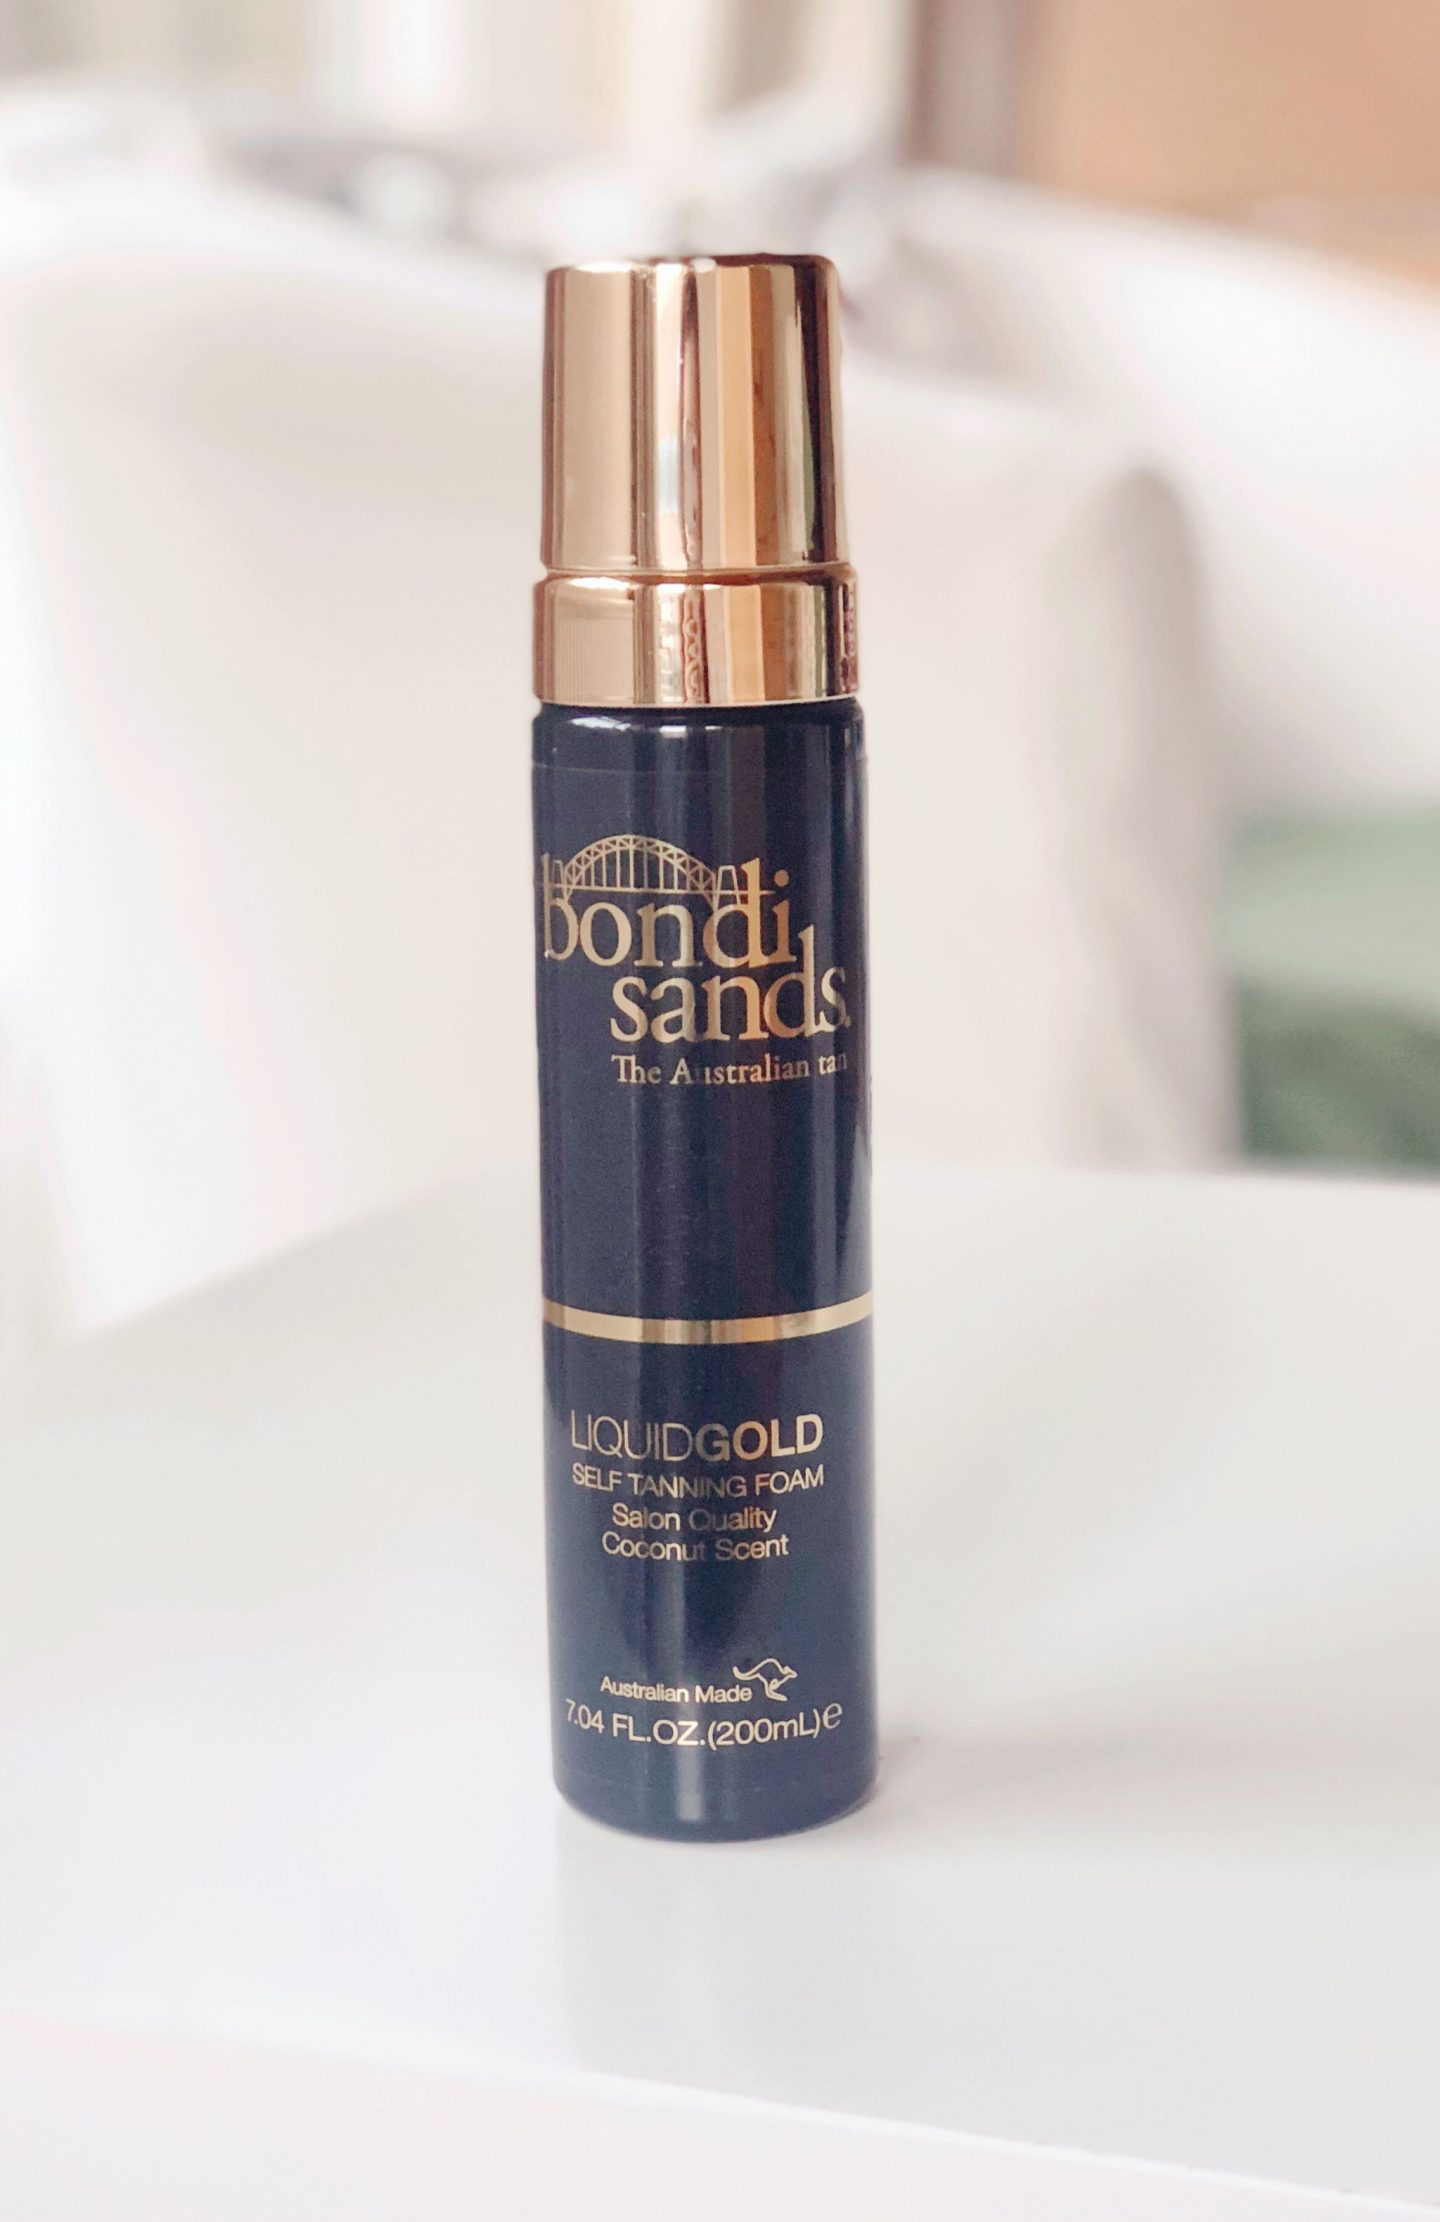 Bondi Sands Liquid Gold Self Tanning Fam